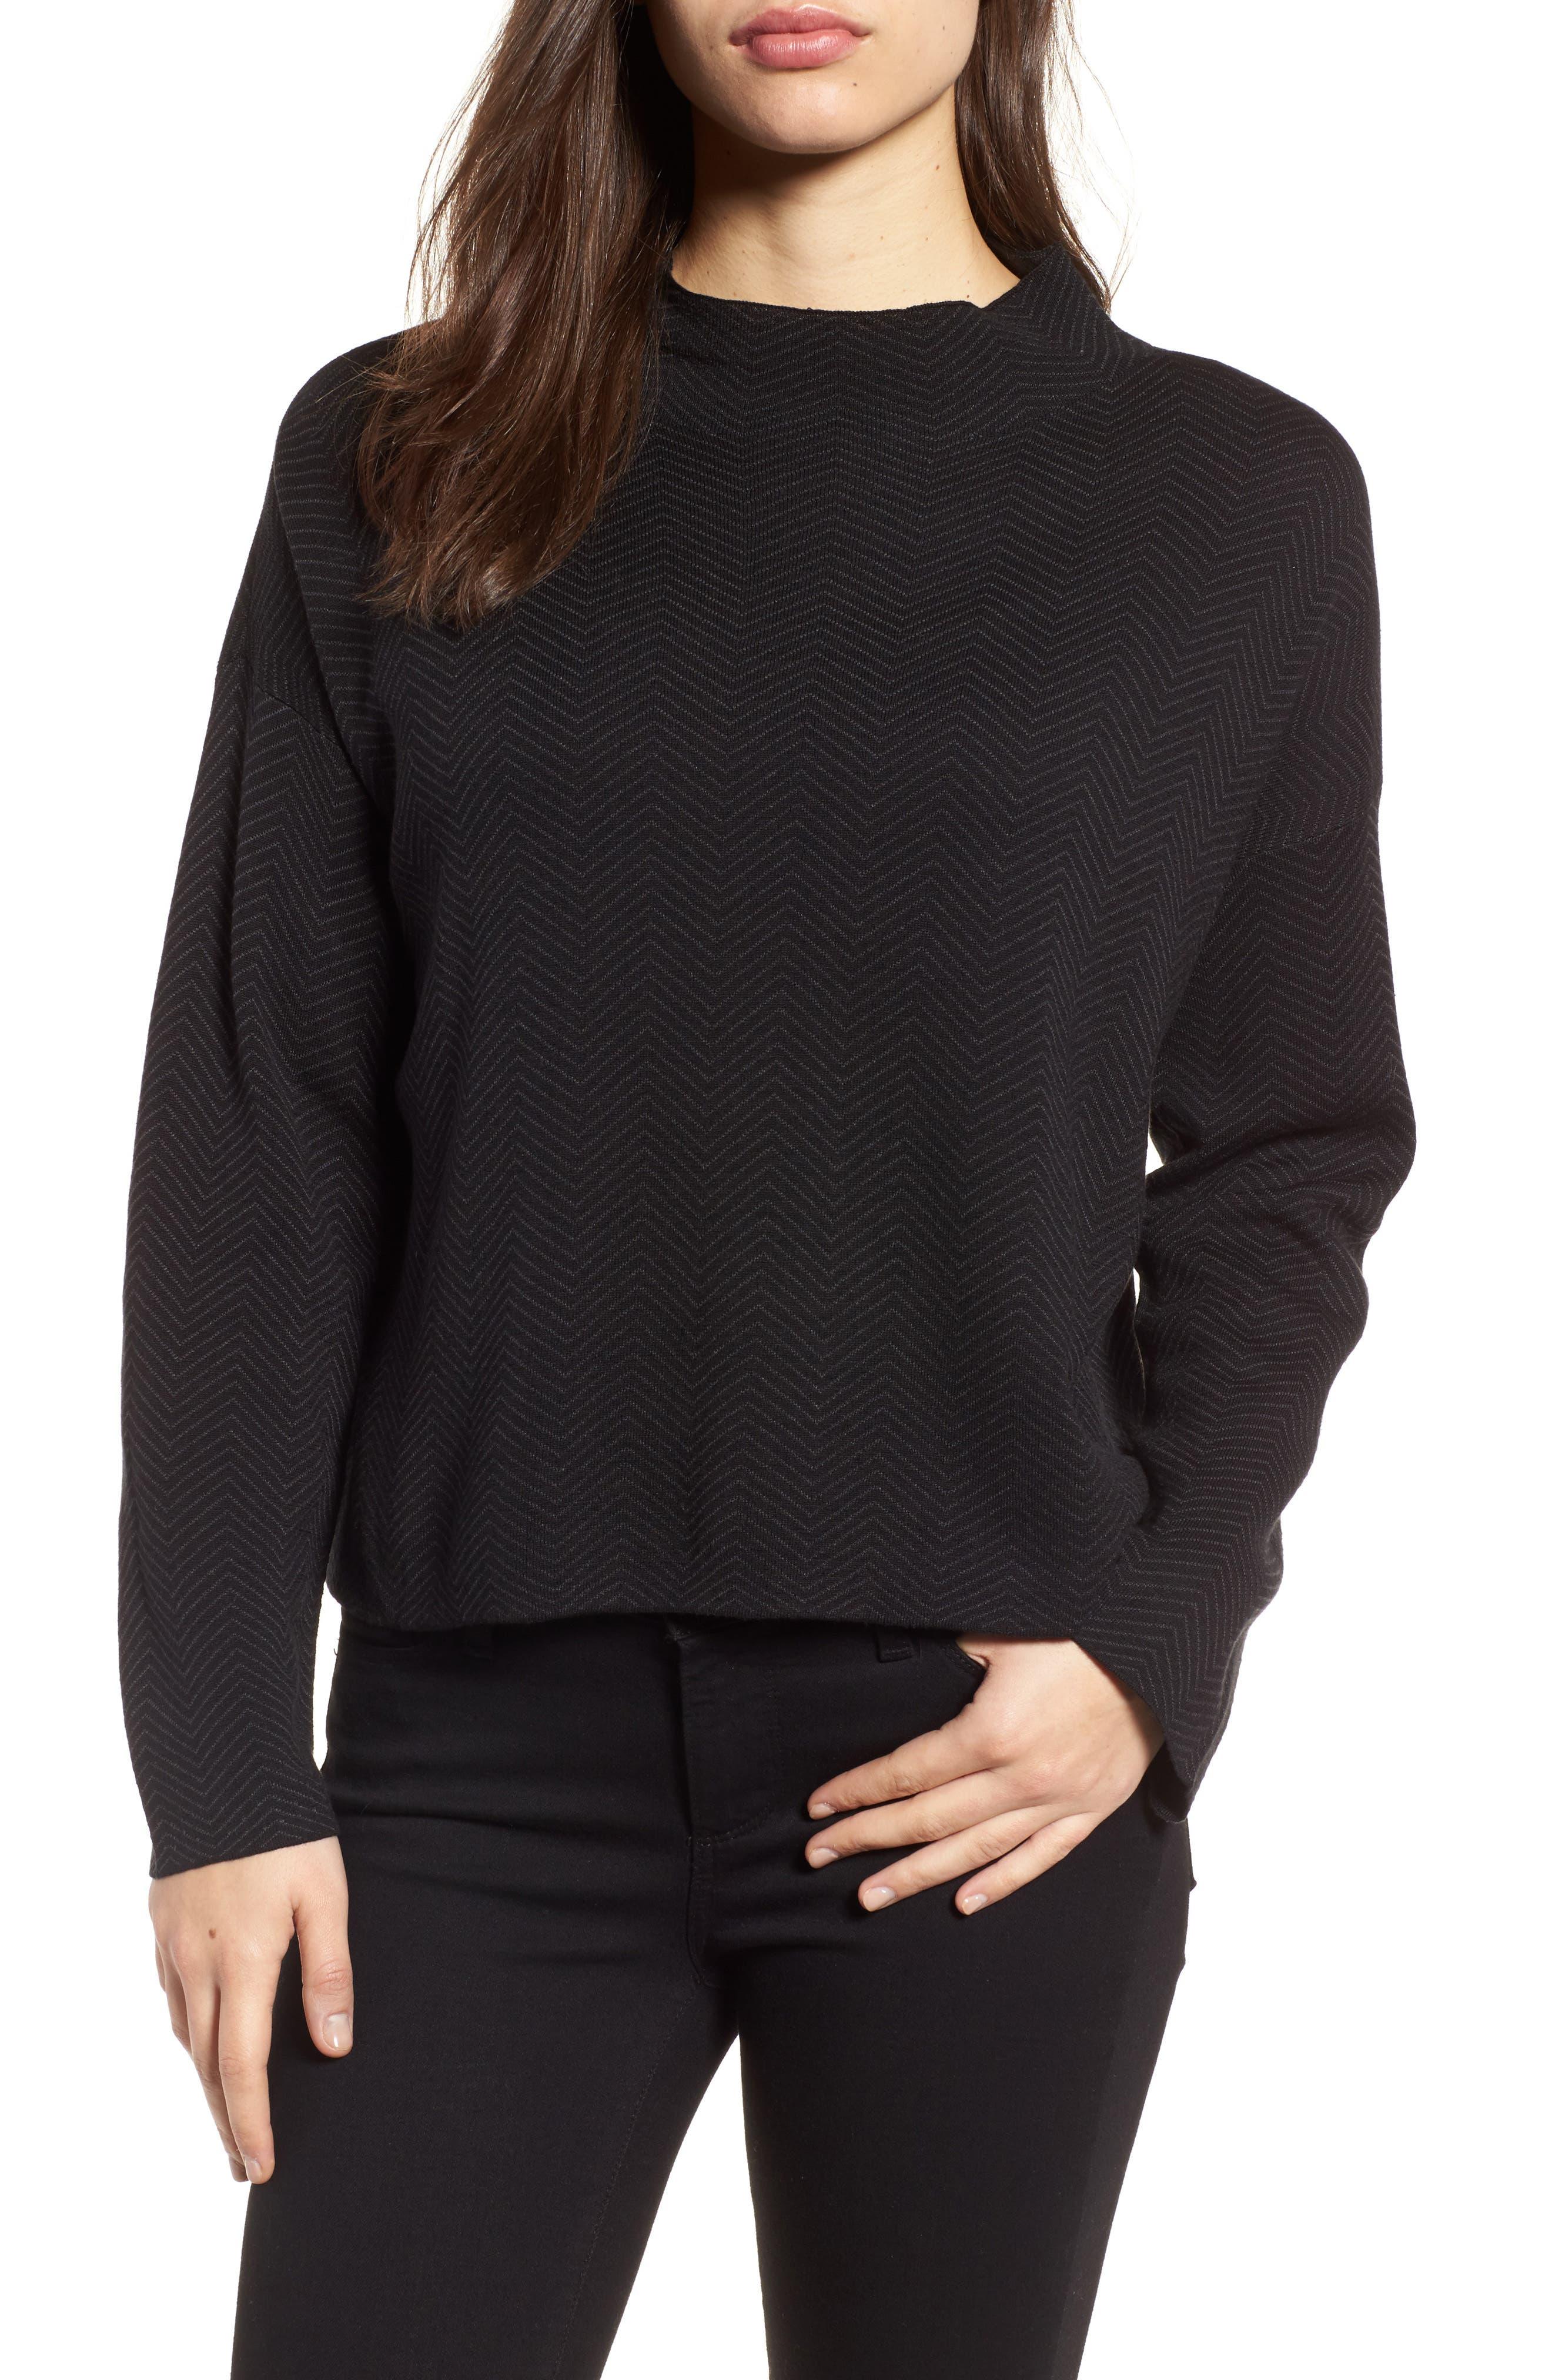 Eileen Fisher Silk & Organic Cotton Jacquard Top